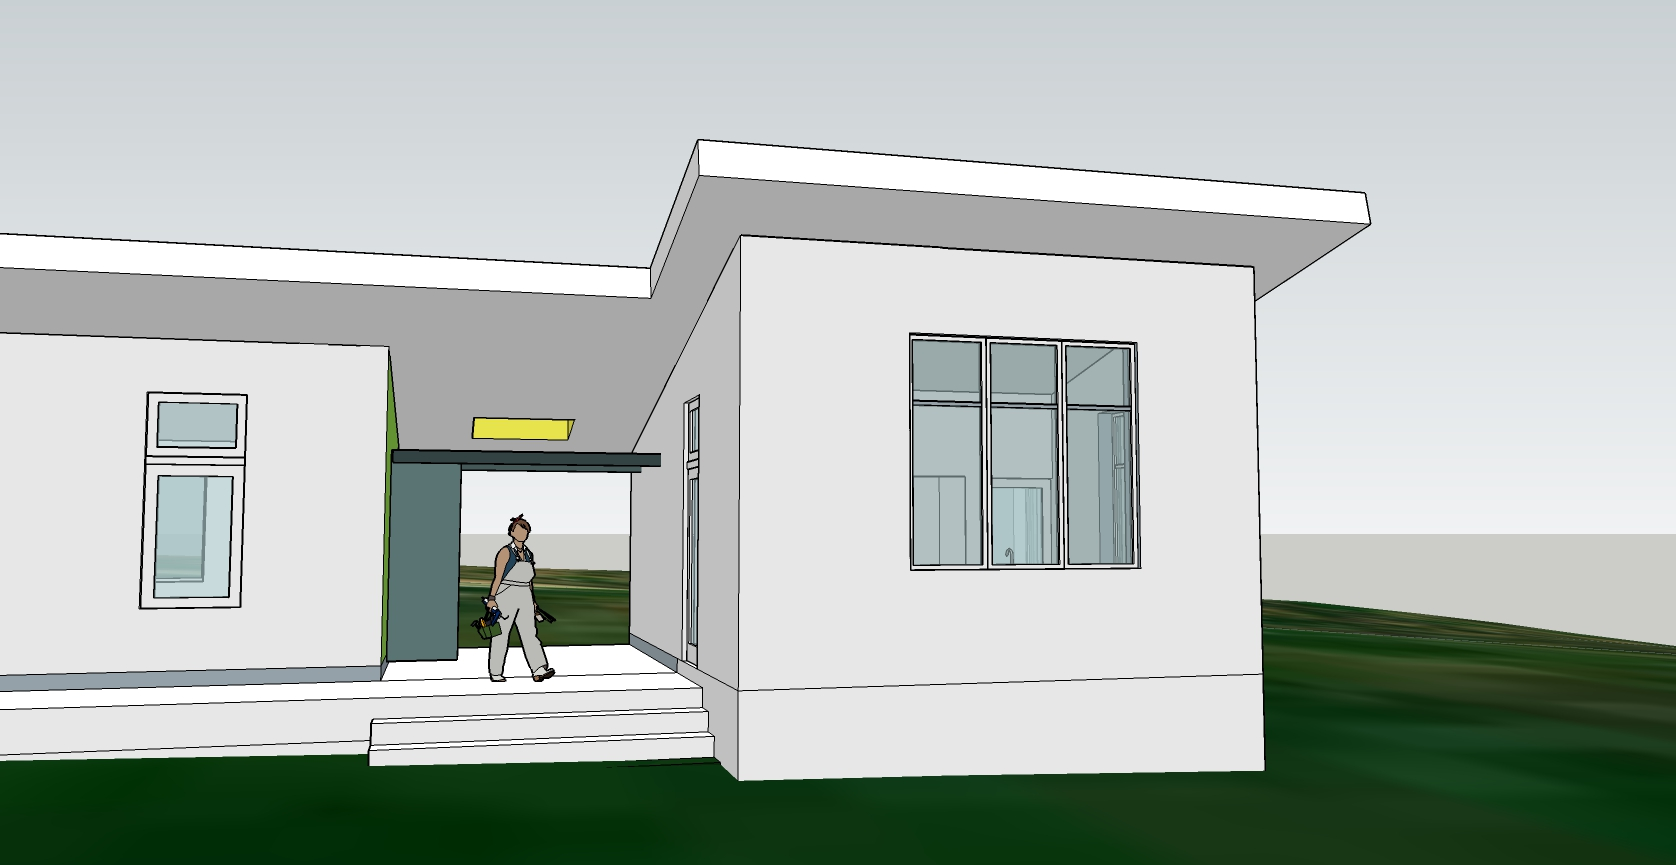 Final Proposal - breezeway with exterior shower